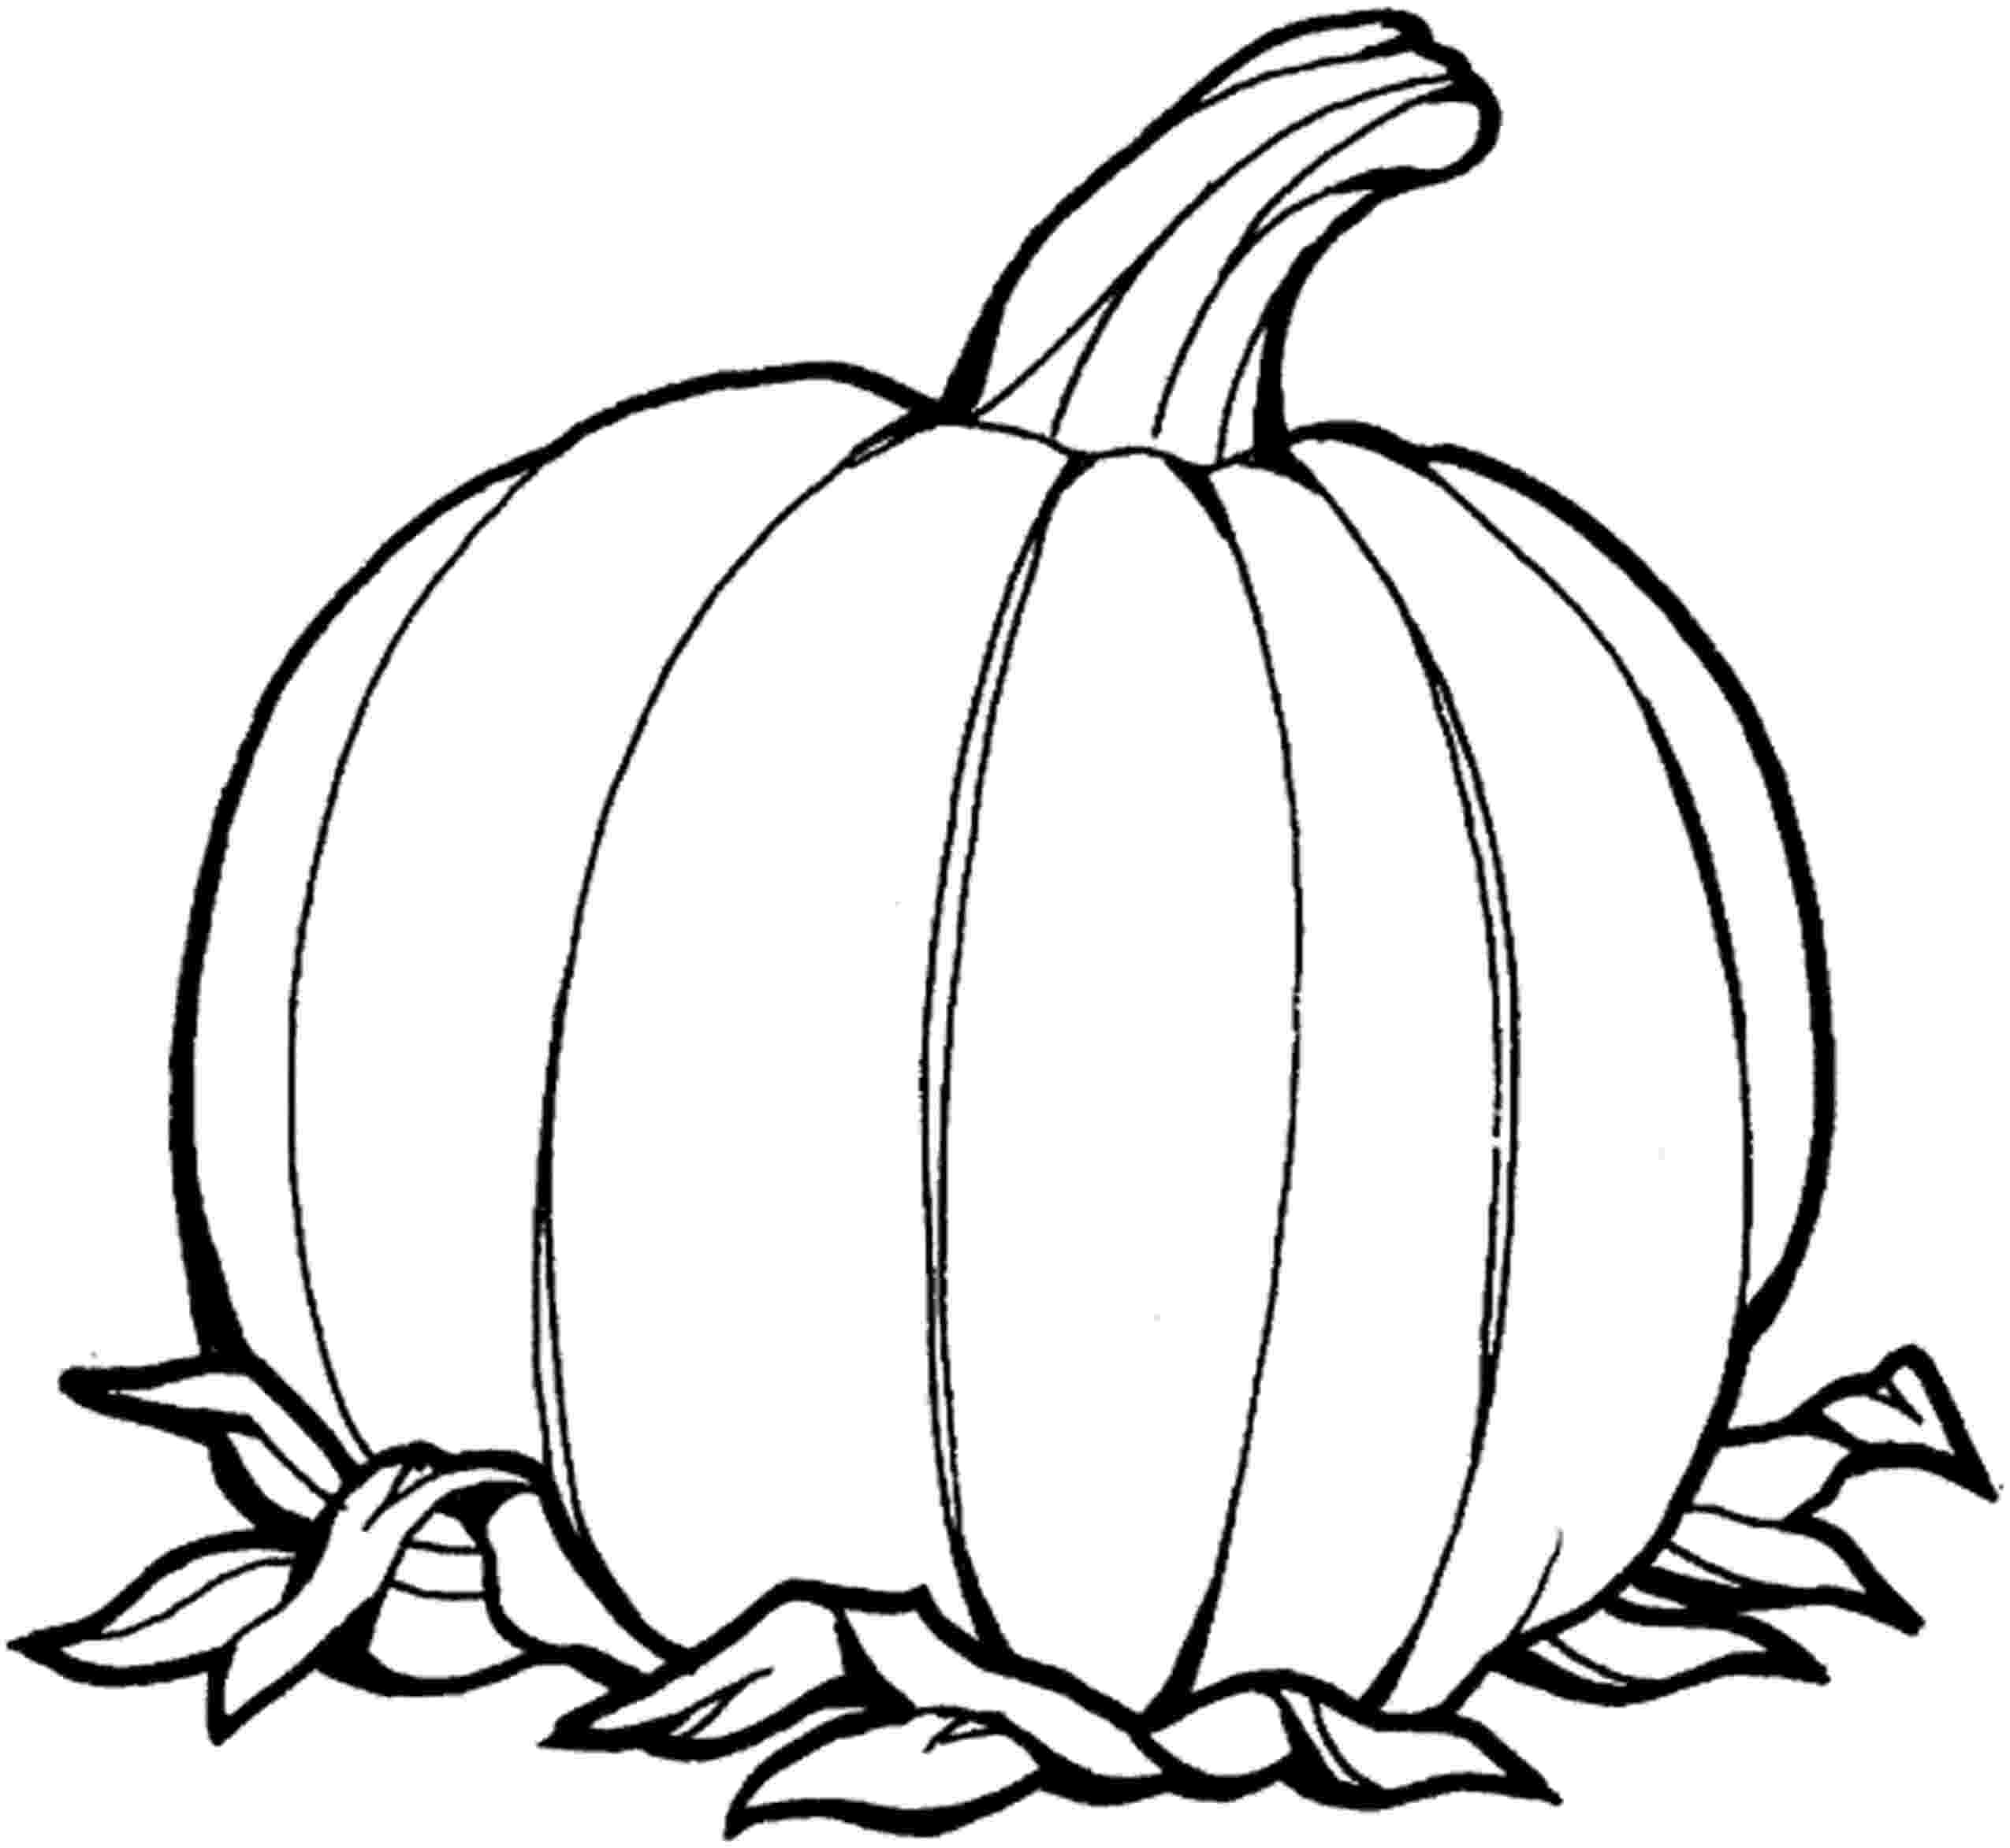 coloring pages pumpkins print print download pumpkin coloring pages and benefits of pumpkins coloring pages print